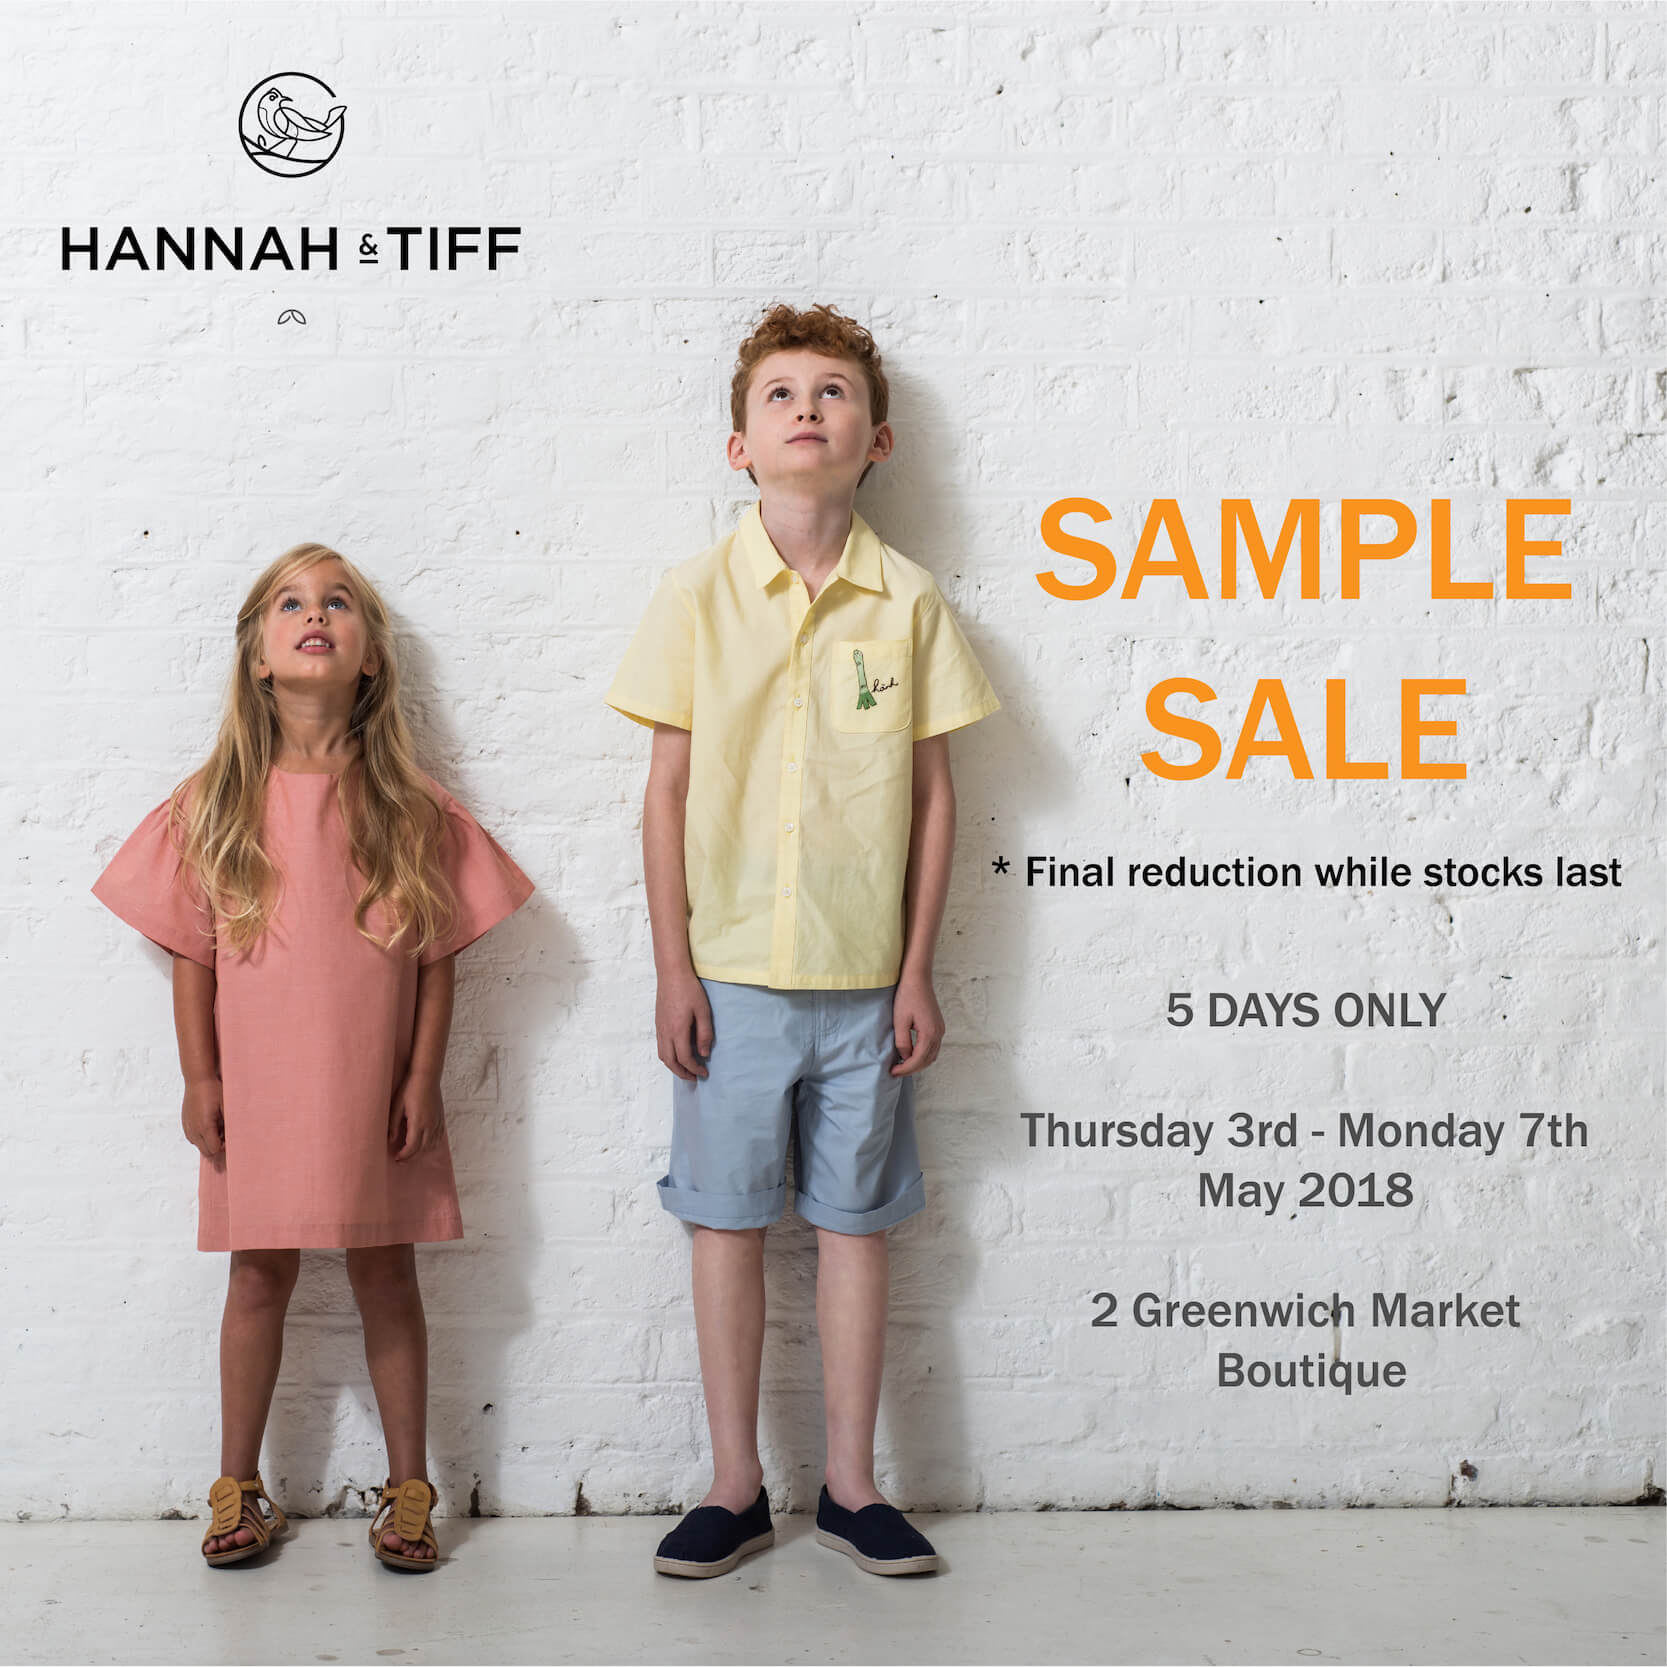 Hannah & Tiff S/S 2018